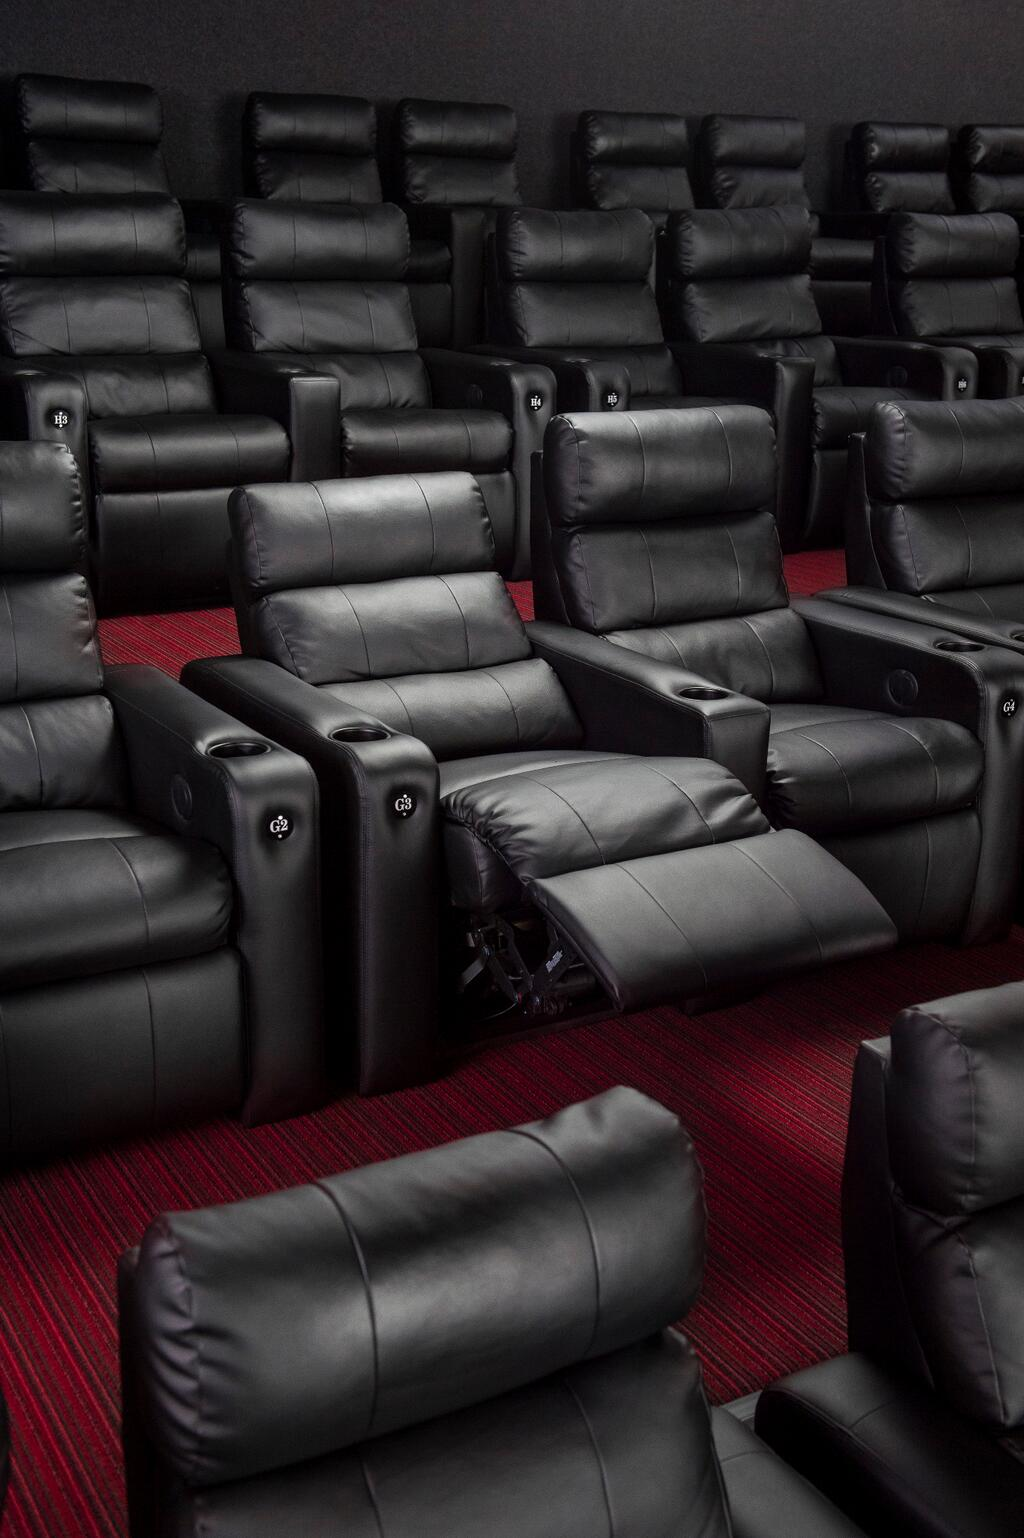 Courtney osgood on twitter showcase cinemas woburn gets for Woburn showcase